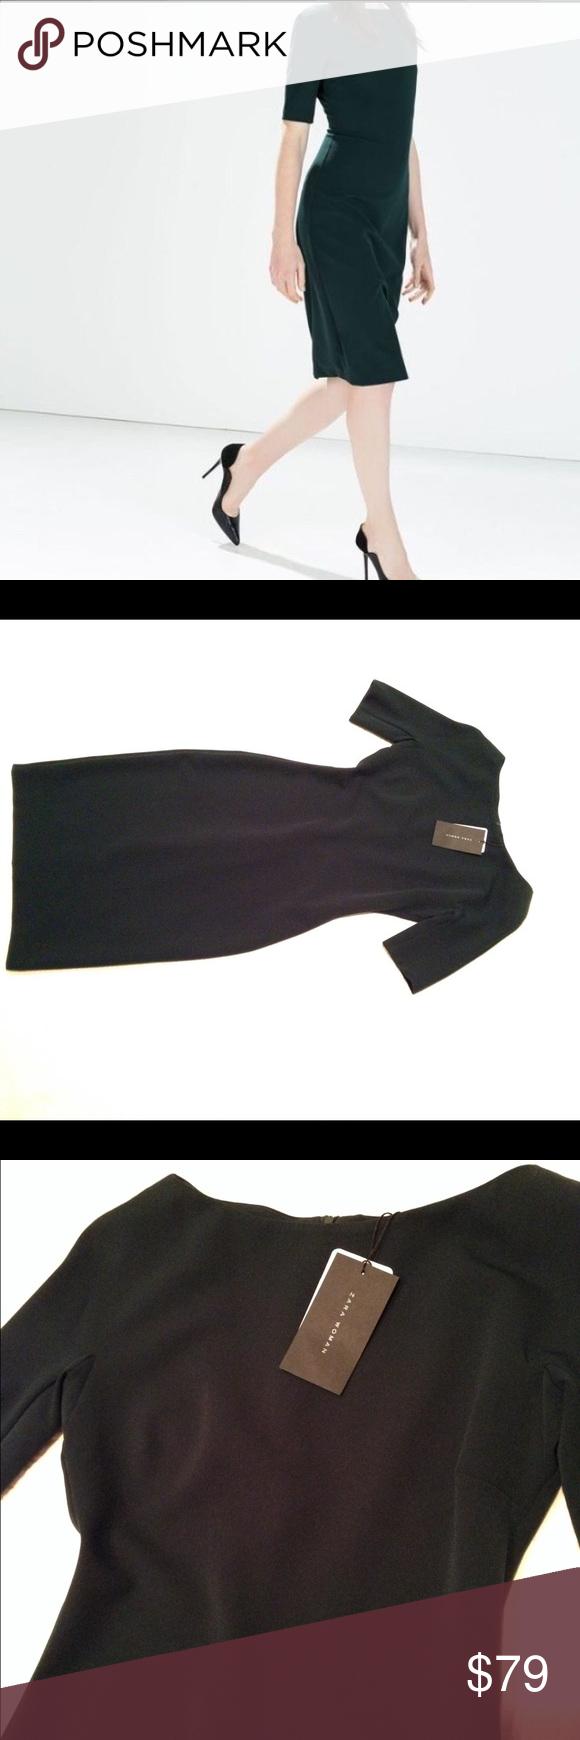 "Zara dark green pencil dress Zara dress , chest 34"" waist 29"" hips 36"" length 42"" , 85% polyester 15% elastane Zara Dresses Midi"